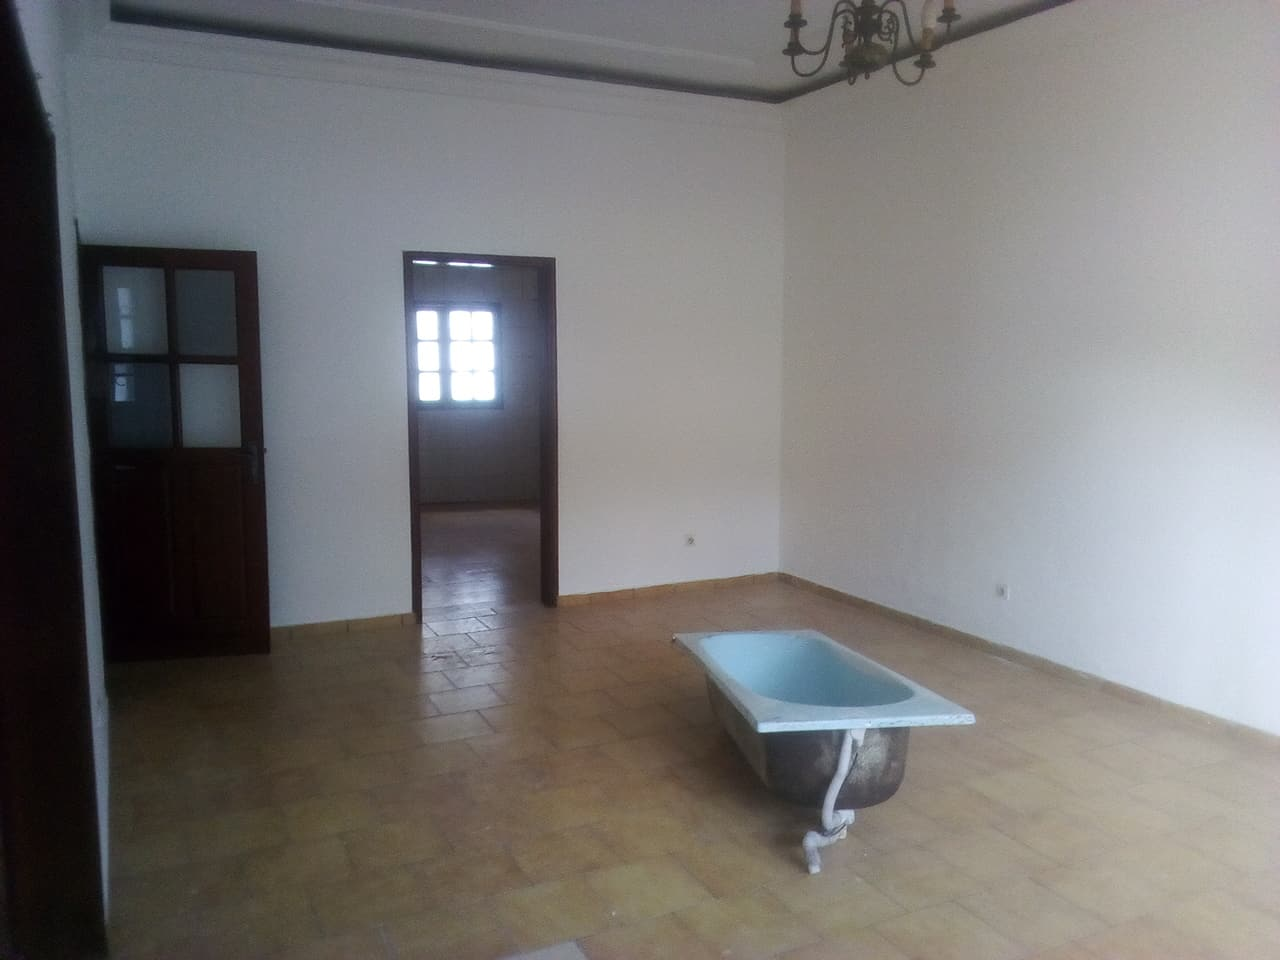 House (Villa) to rent - Yaoundé, Bastos, pas loin de dovv - 1 living room(s), 4 bedroom(s), 3 bathroom(s) - 800 000 FCFA / month